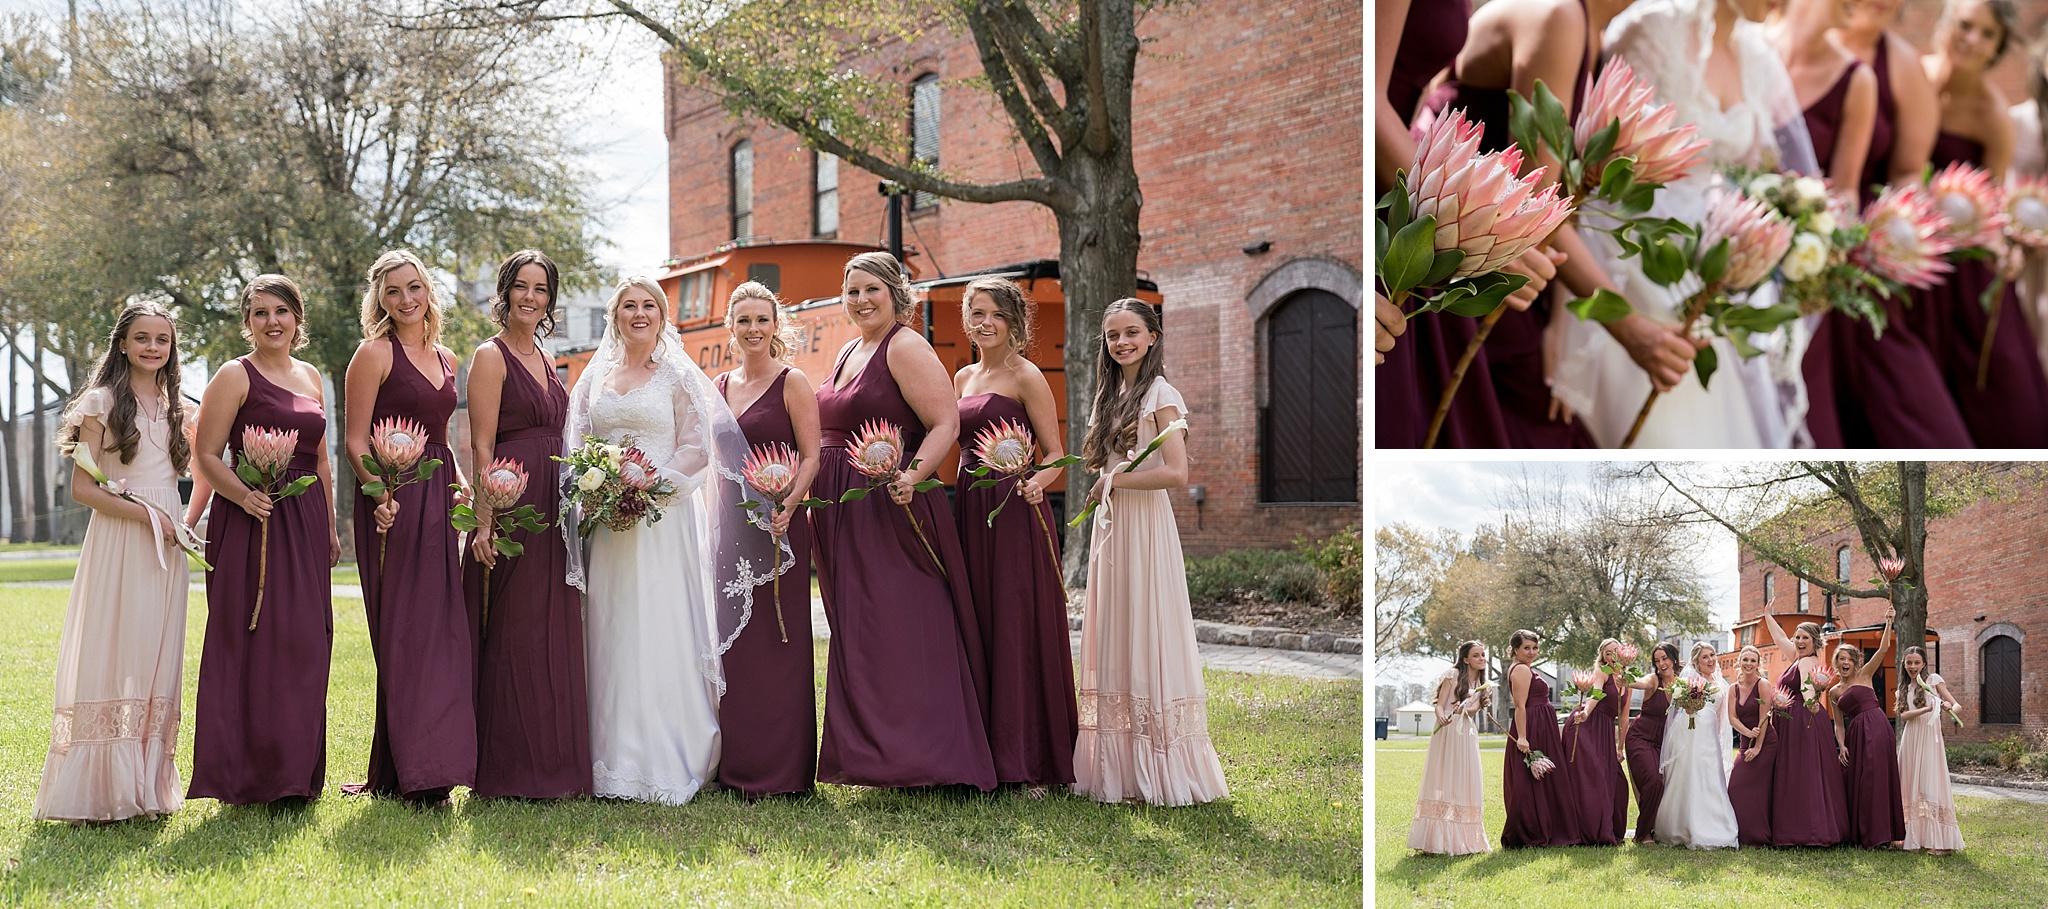 Washington-NC-Wedding-Photography-164.jpg